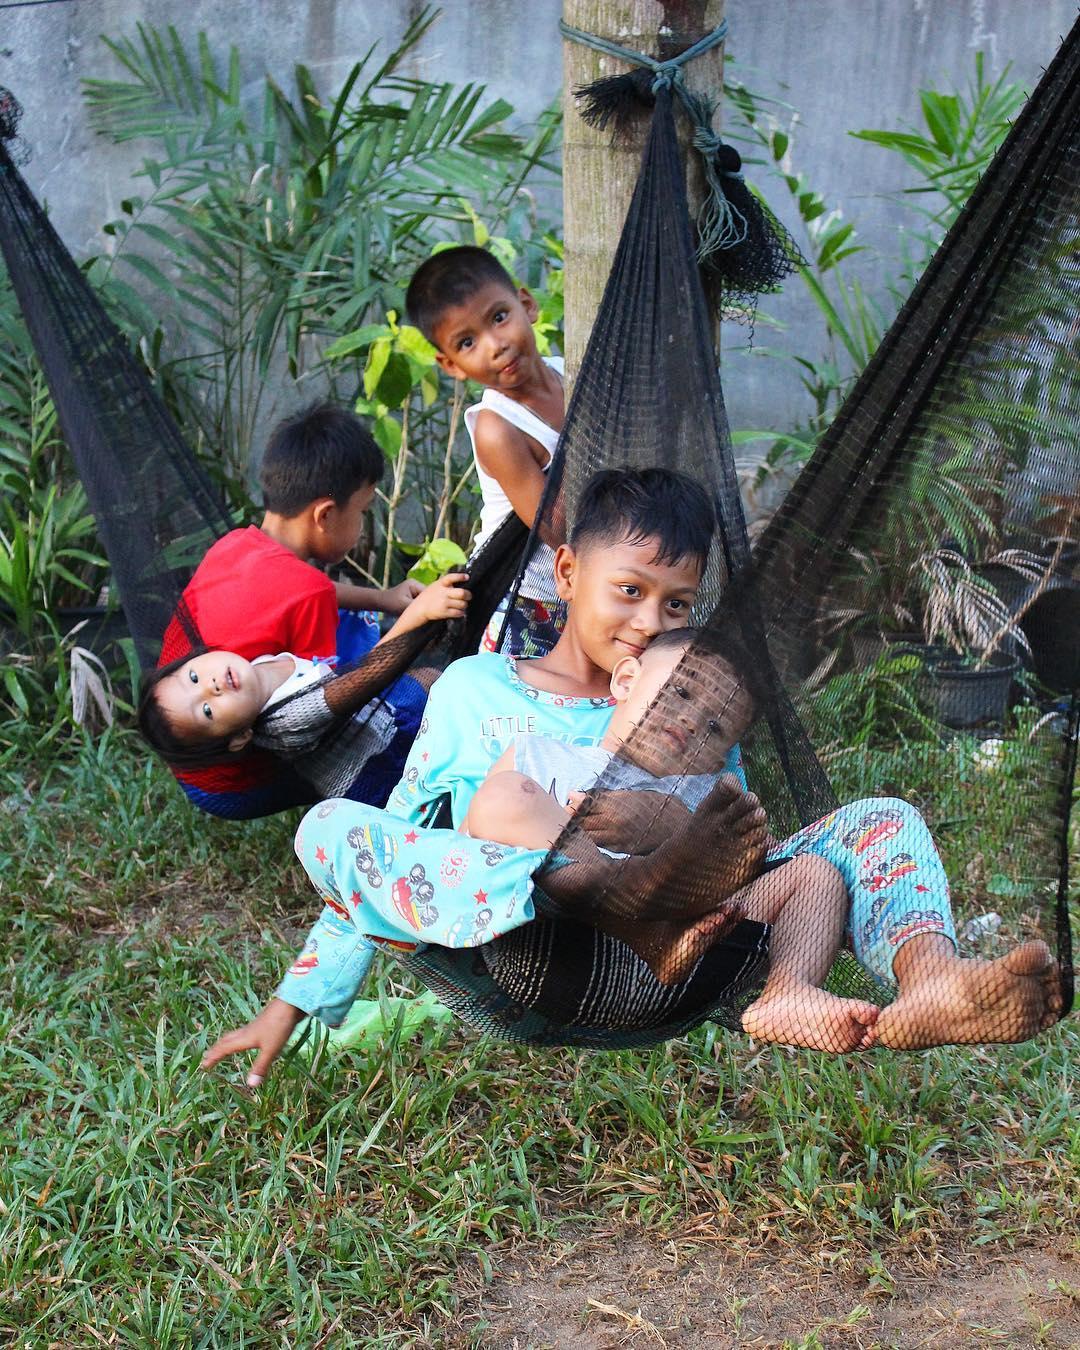 Sourires, balançoires et Filets de pêche ... . . ⛴______ ➕ l  Les îles SURIN . ? | Khao Lak • Côte Ouest Thaïlande . ? | #PintadeThailande ? | Thaïlande Nord & Côte Ouest ??? ______ #thailande #thailand #bangkok #kohphiphi#kohlanta #kohsamui #kohphangan #kohtao #khaolak #chiangmai #cityguide #cityTrip #travel #blogTravel #TravelBlog #bloggervoyage #voYage #blogVoyage #frenchBlogger #blogueuse #blog #montpellier #pintademontpellier #food #foodlover